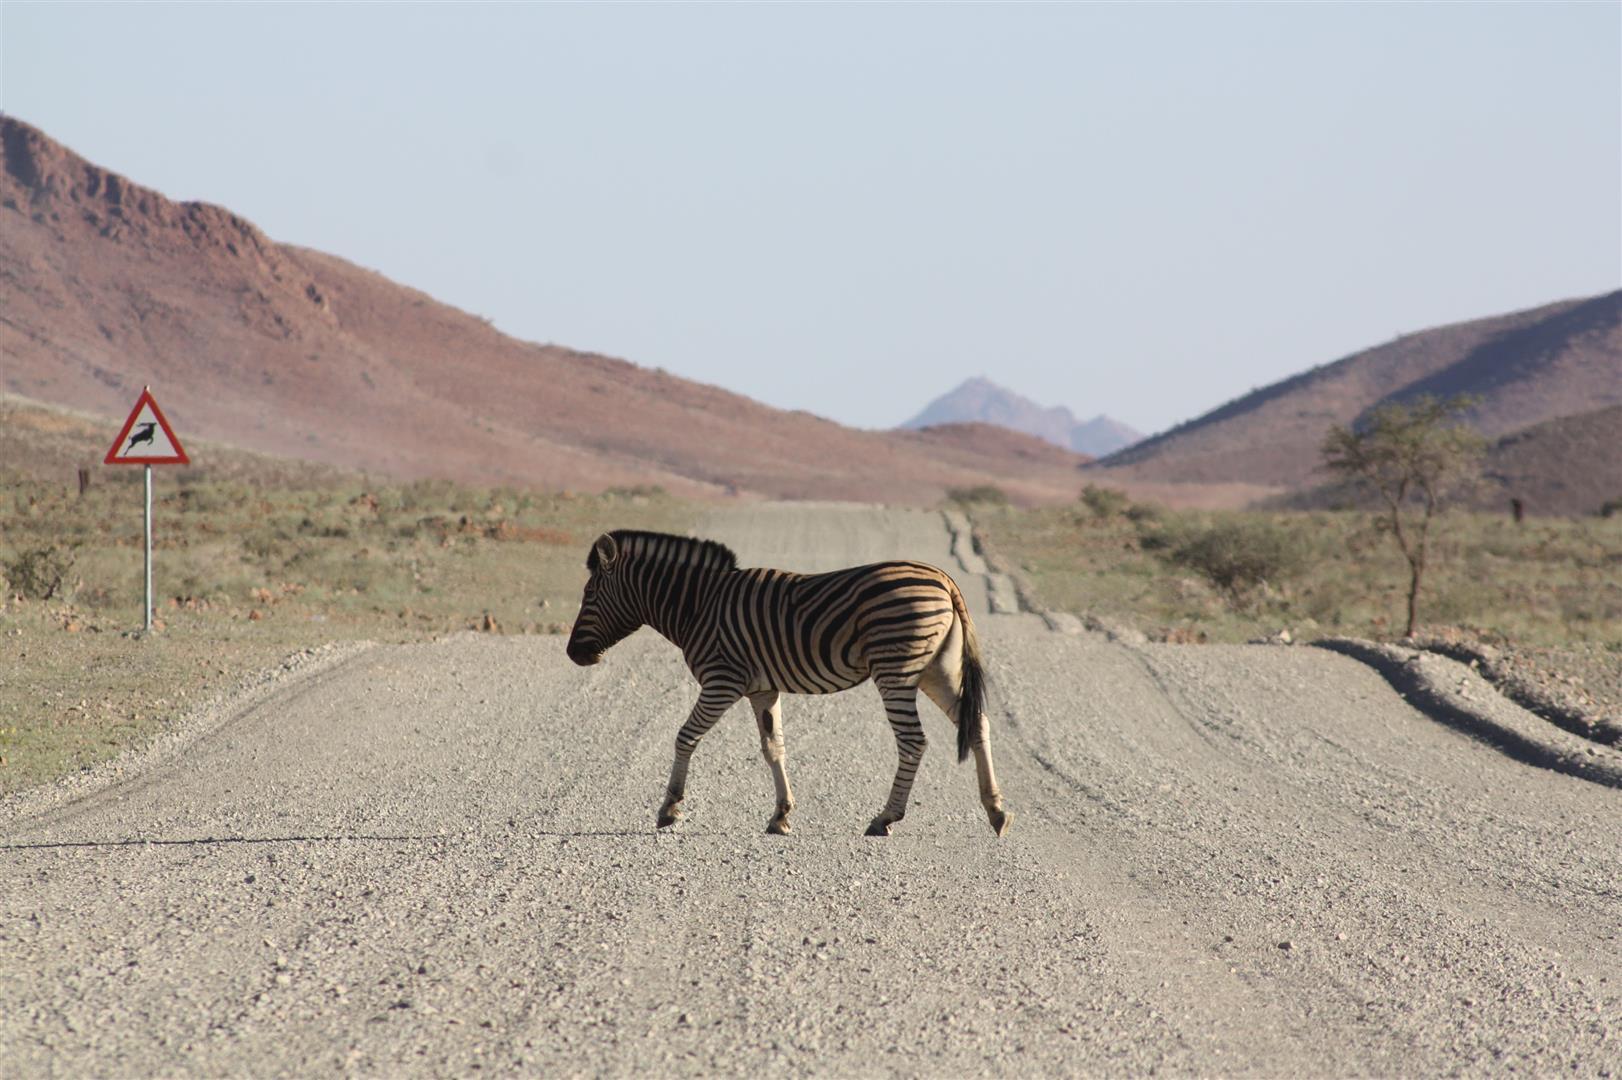 An actual zebra crossing in Namibia